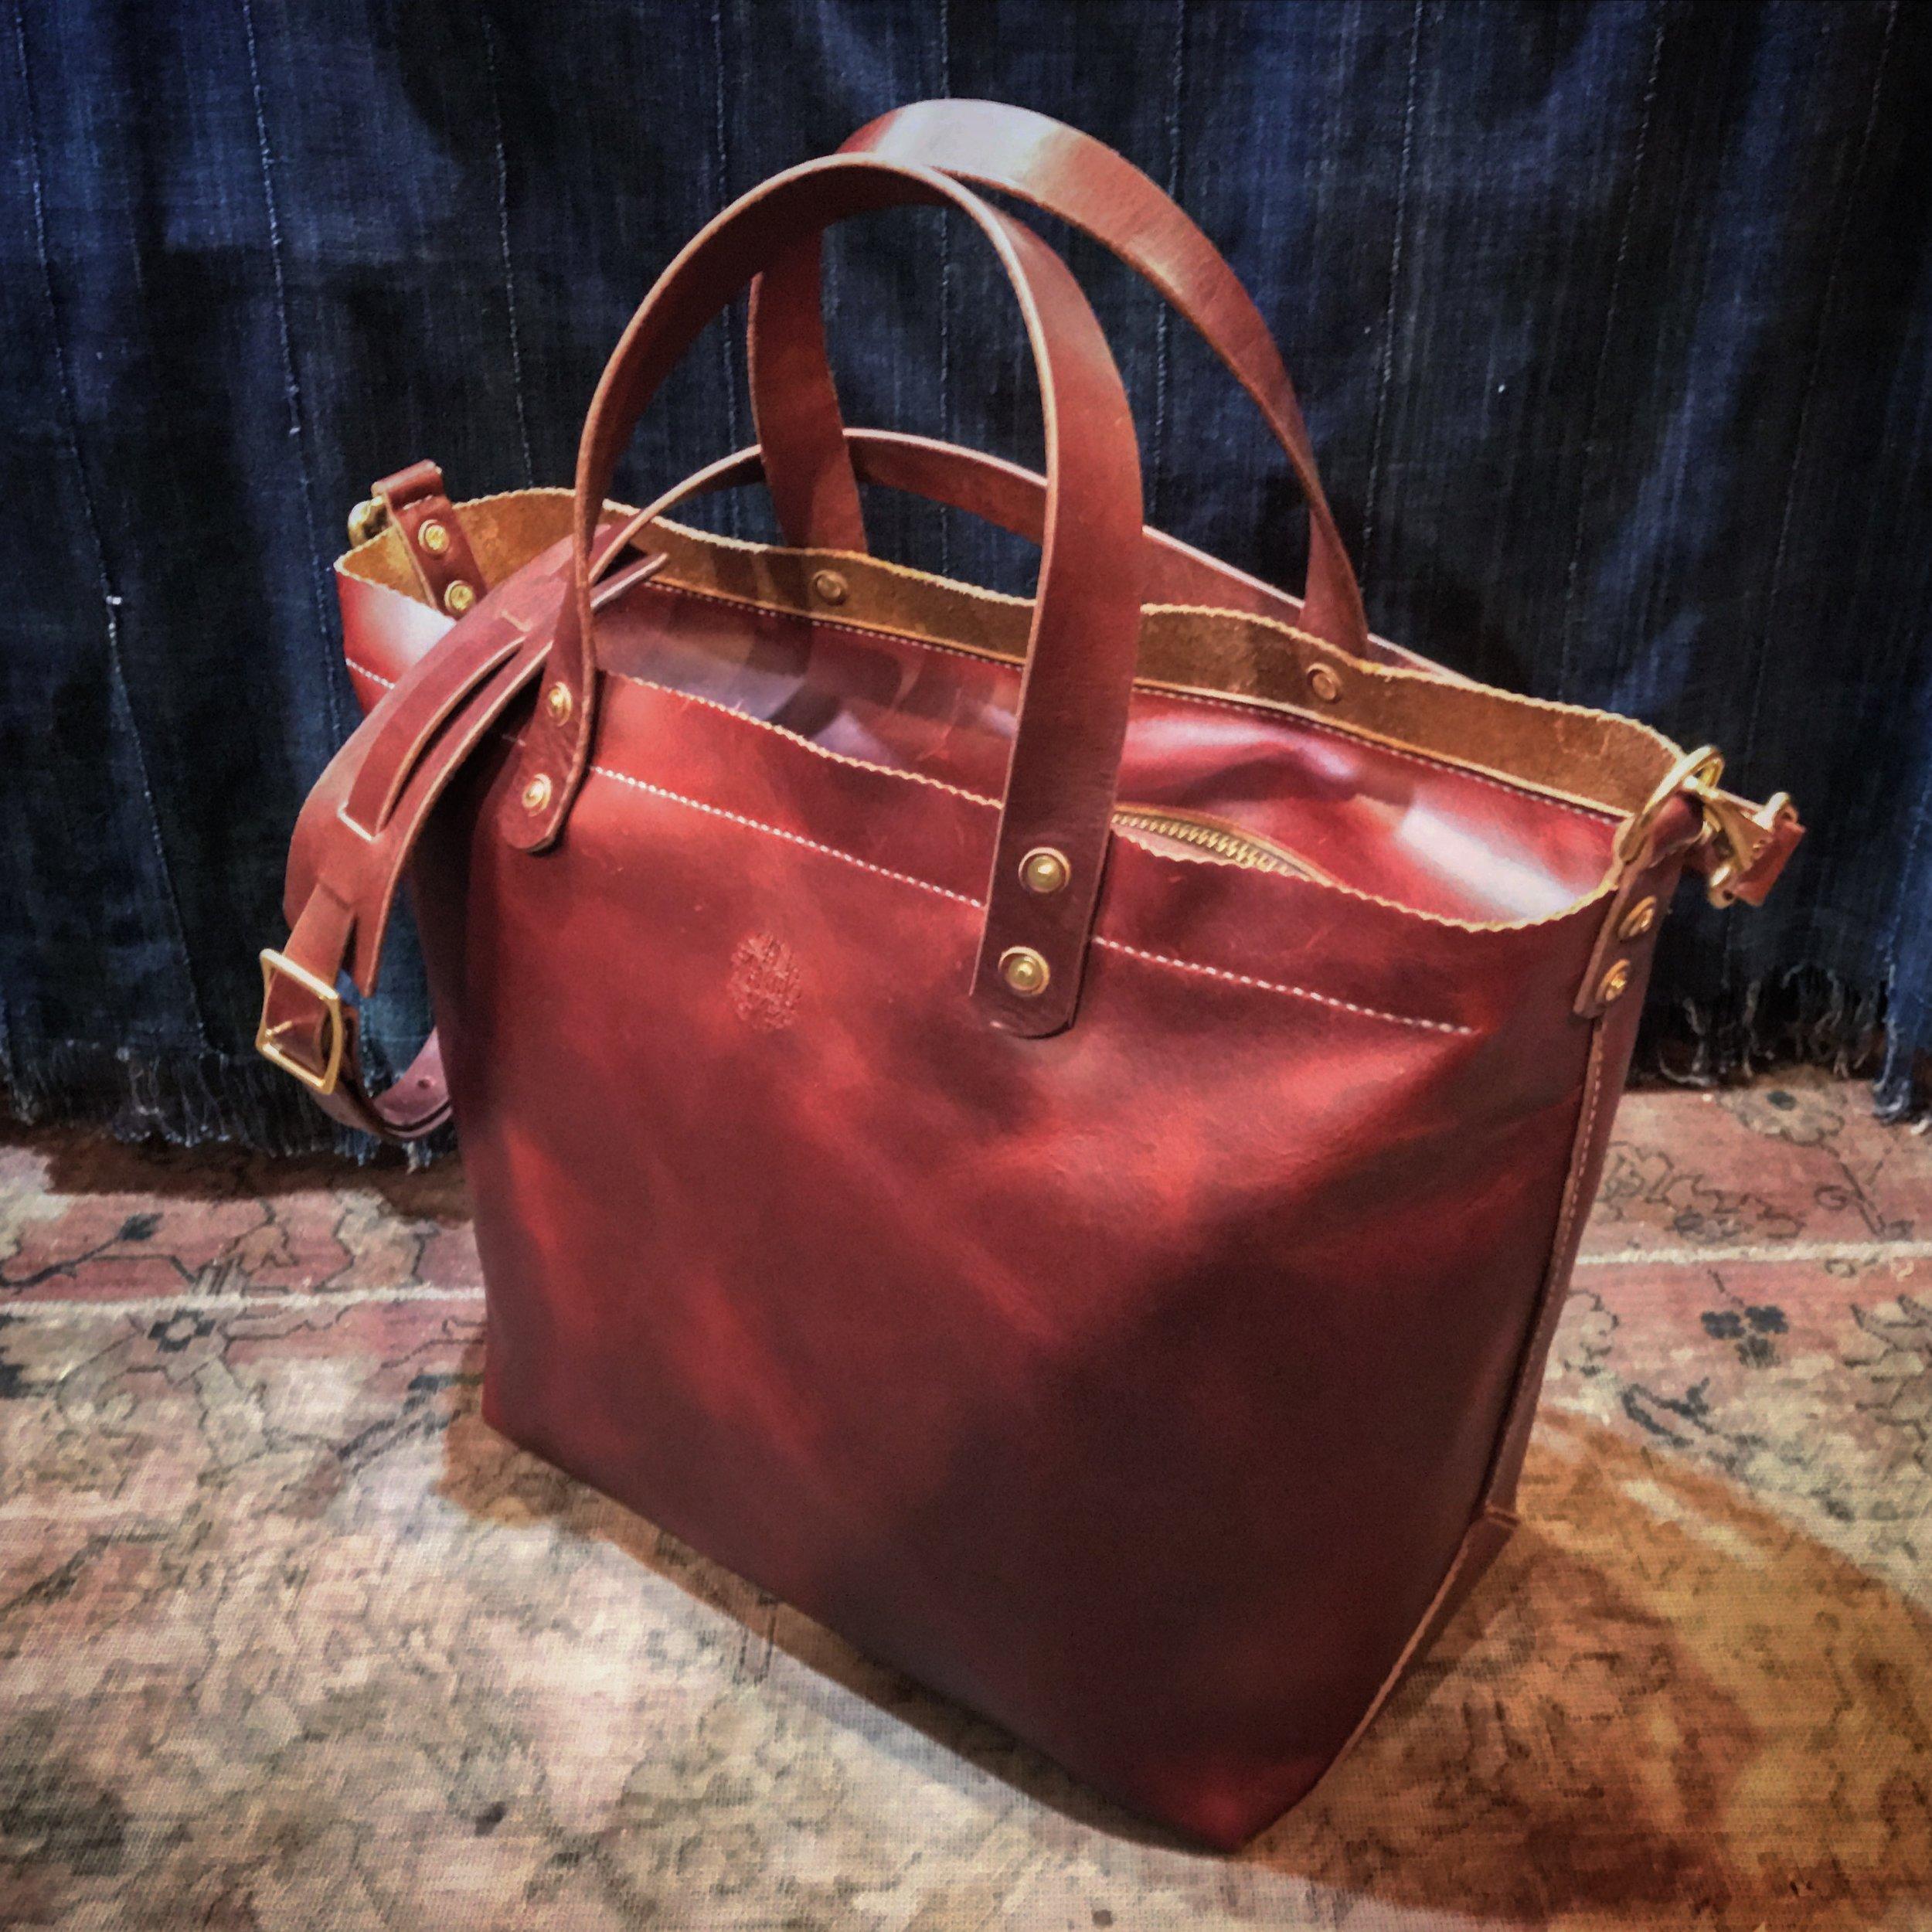 One of Faedi's custom leather bags.